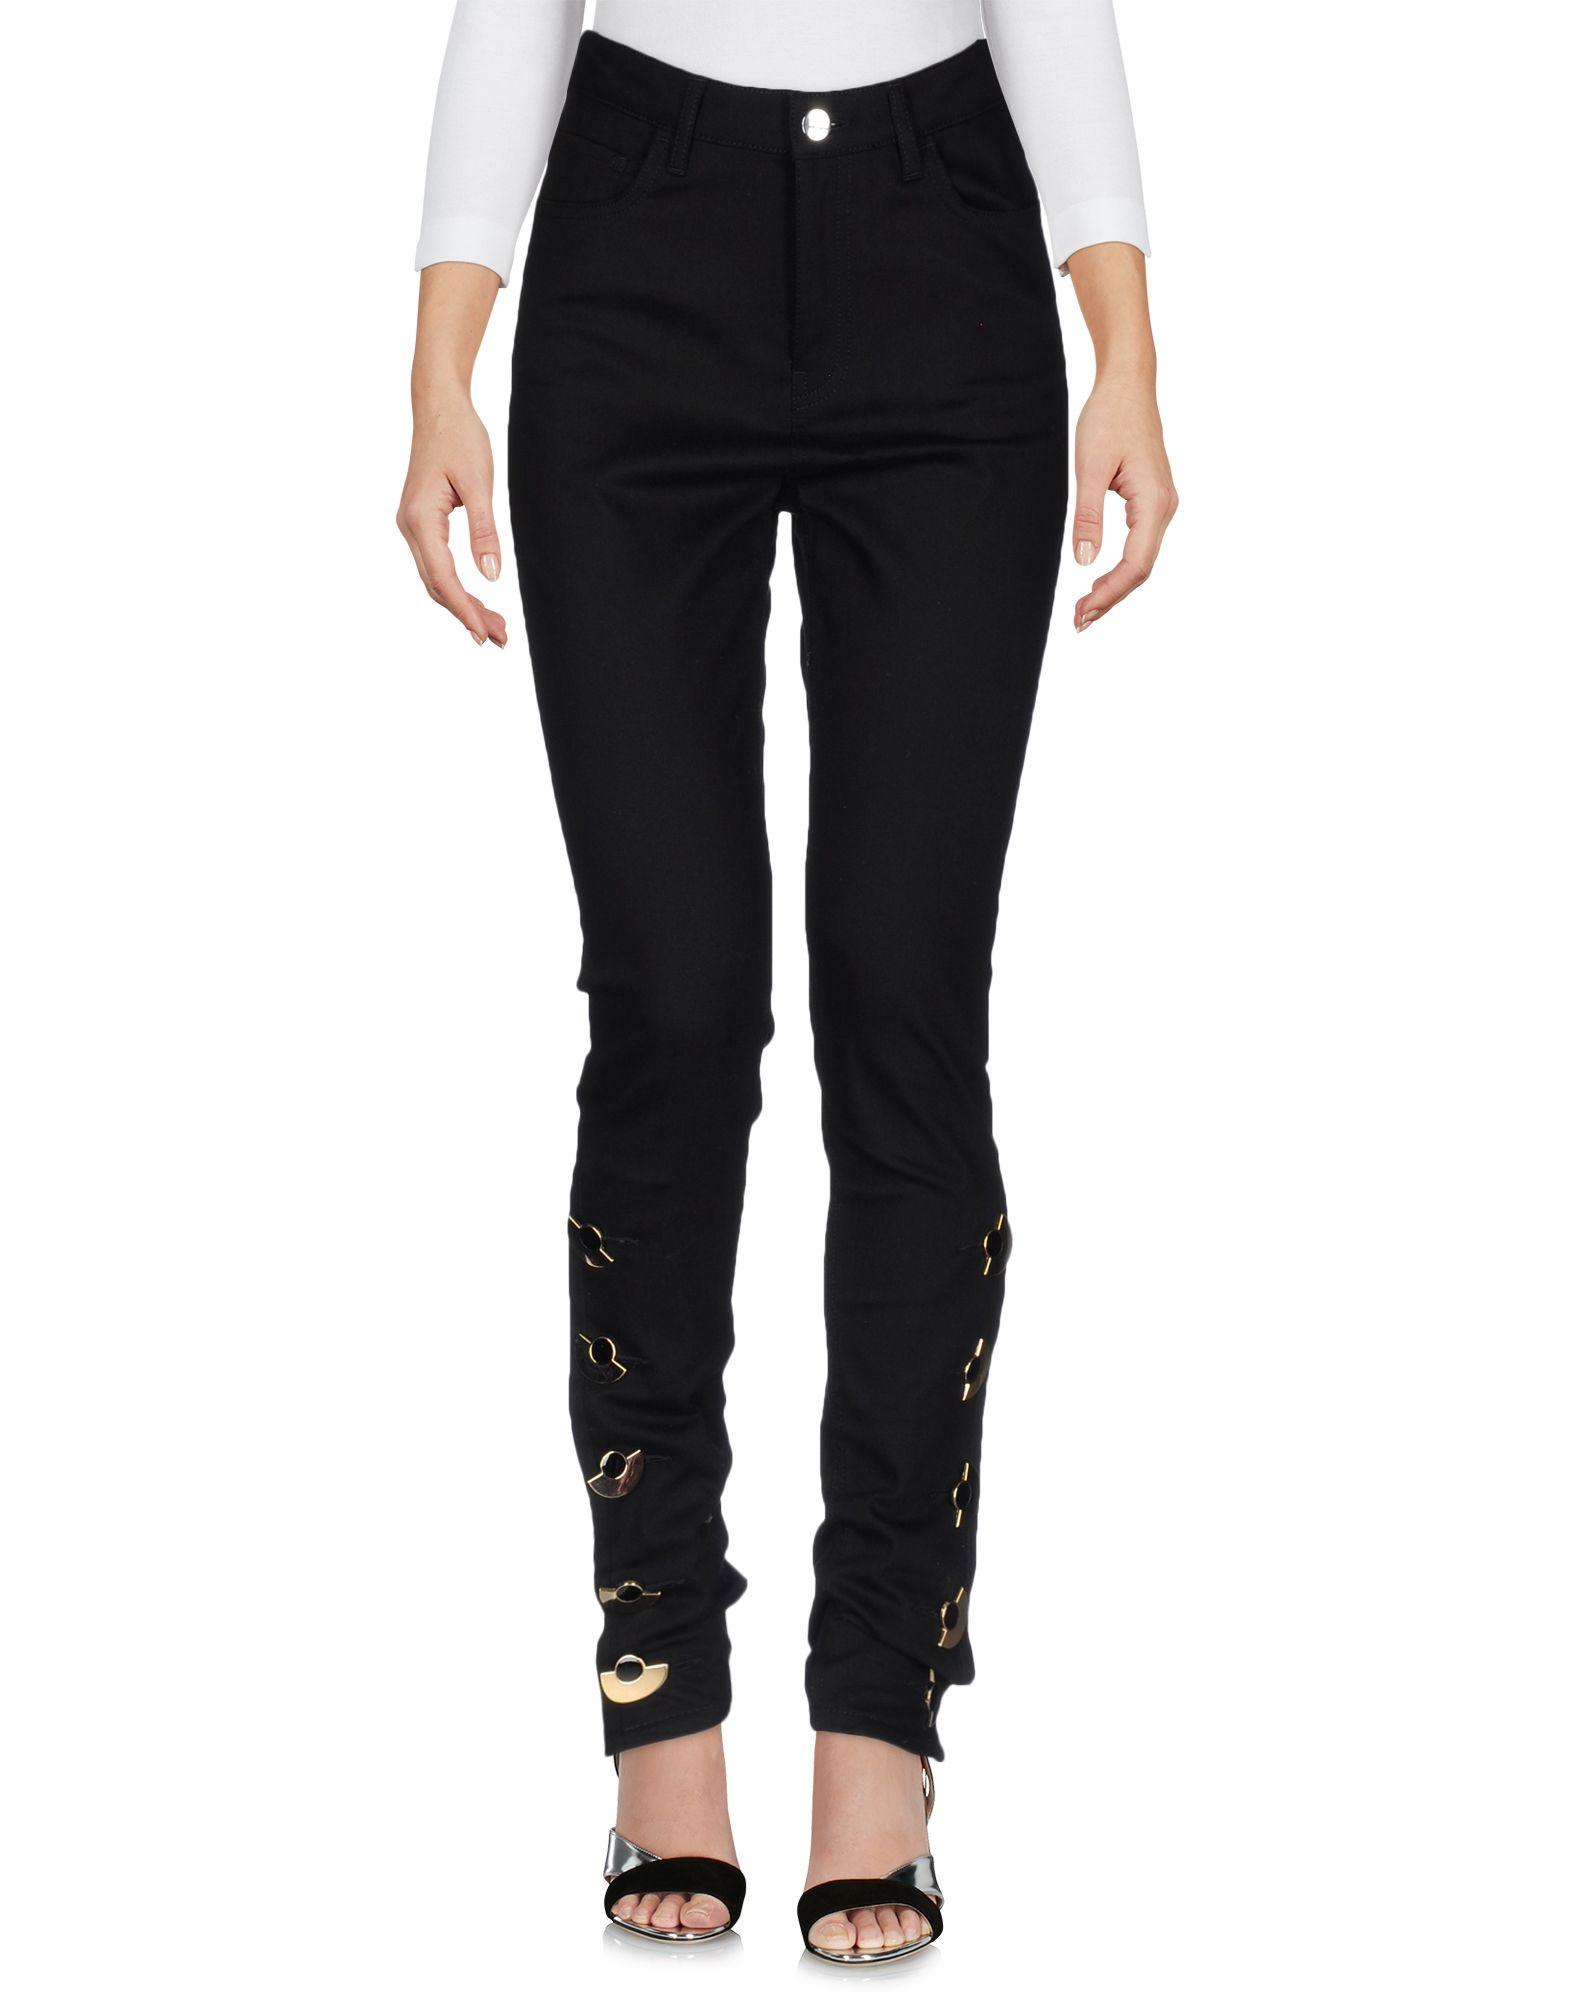 ANTHONY VACCARELLO Denim Pants in Black